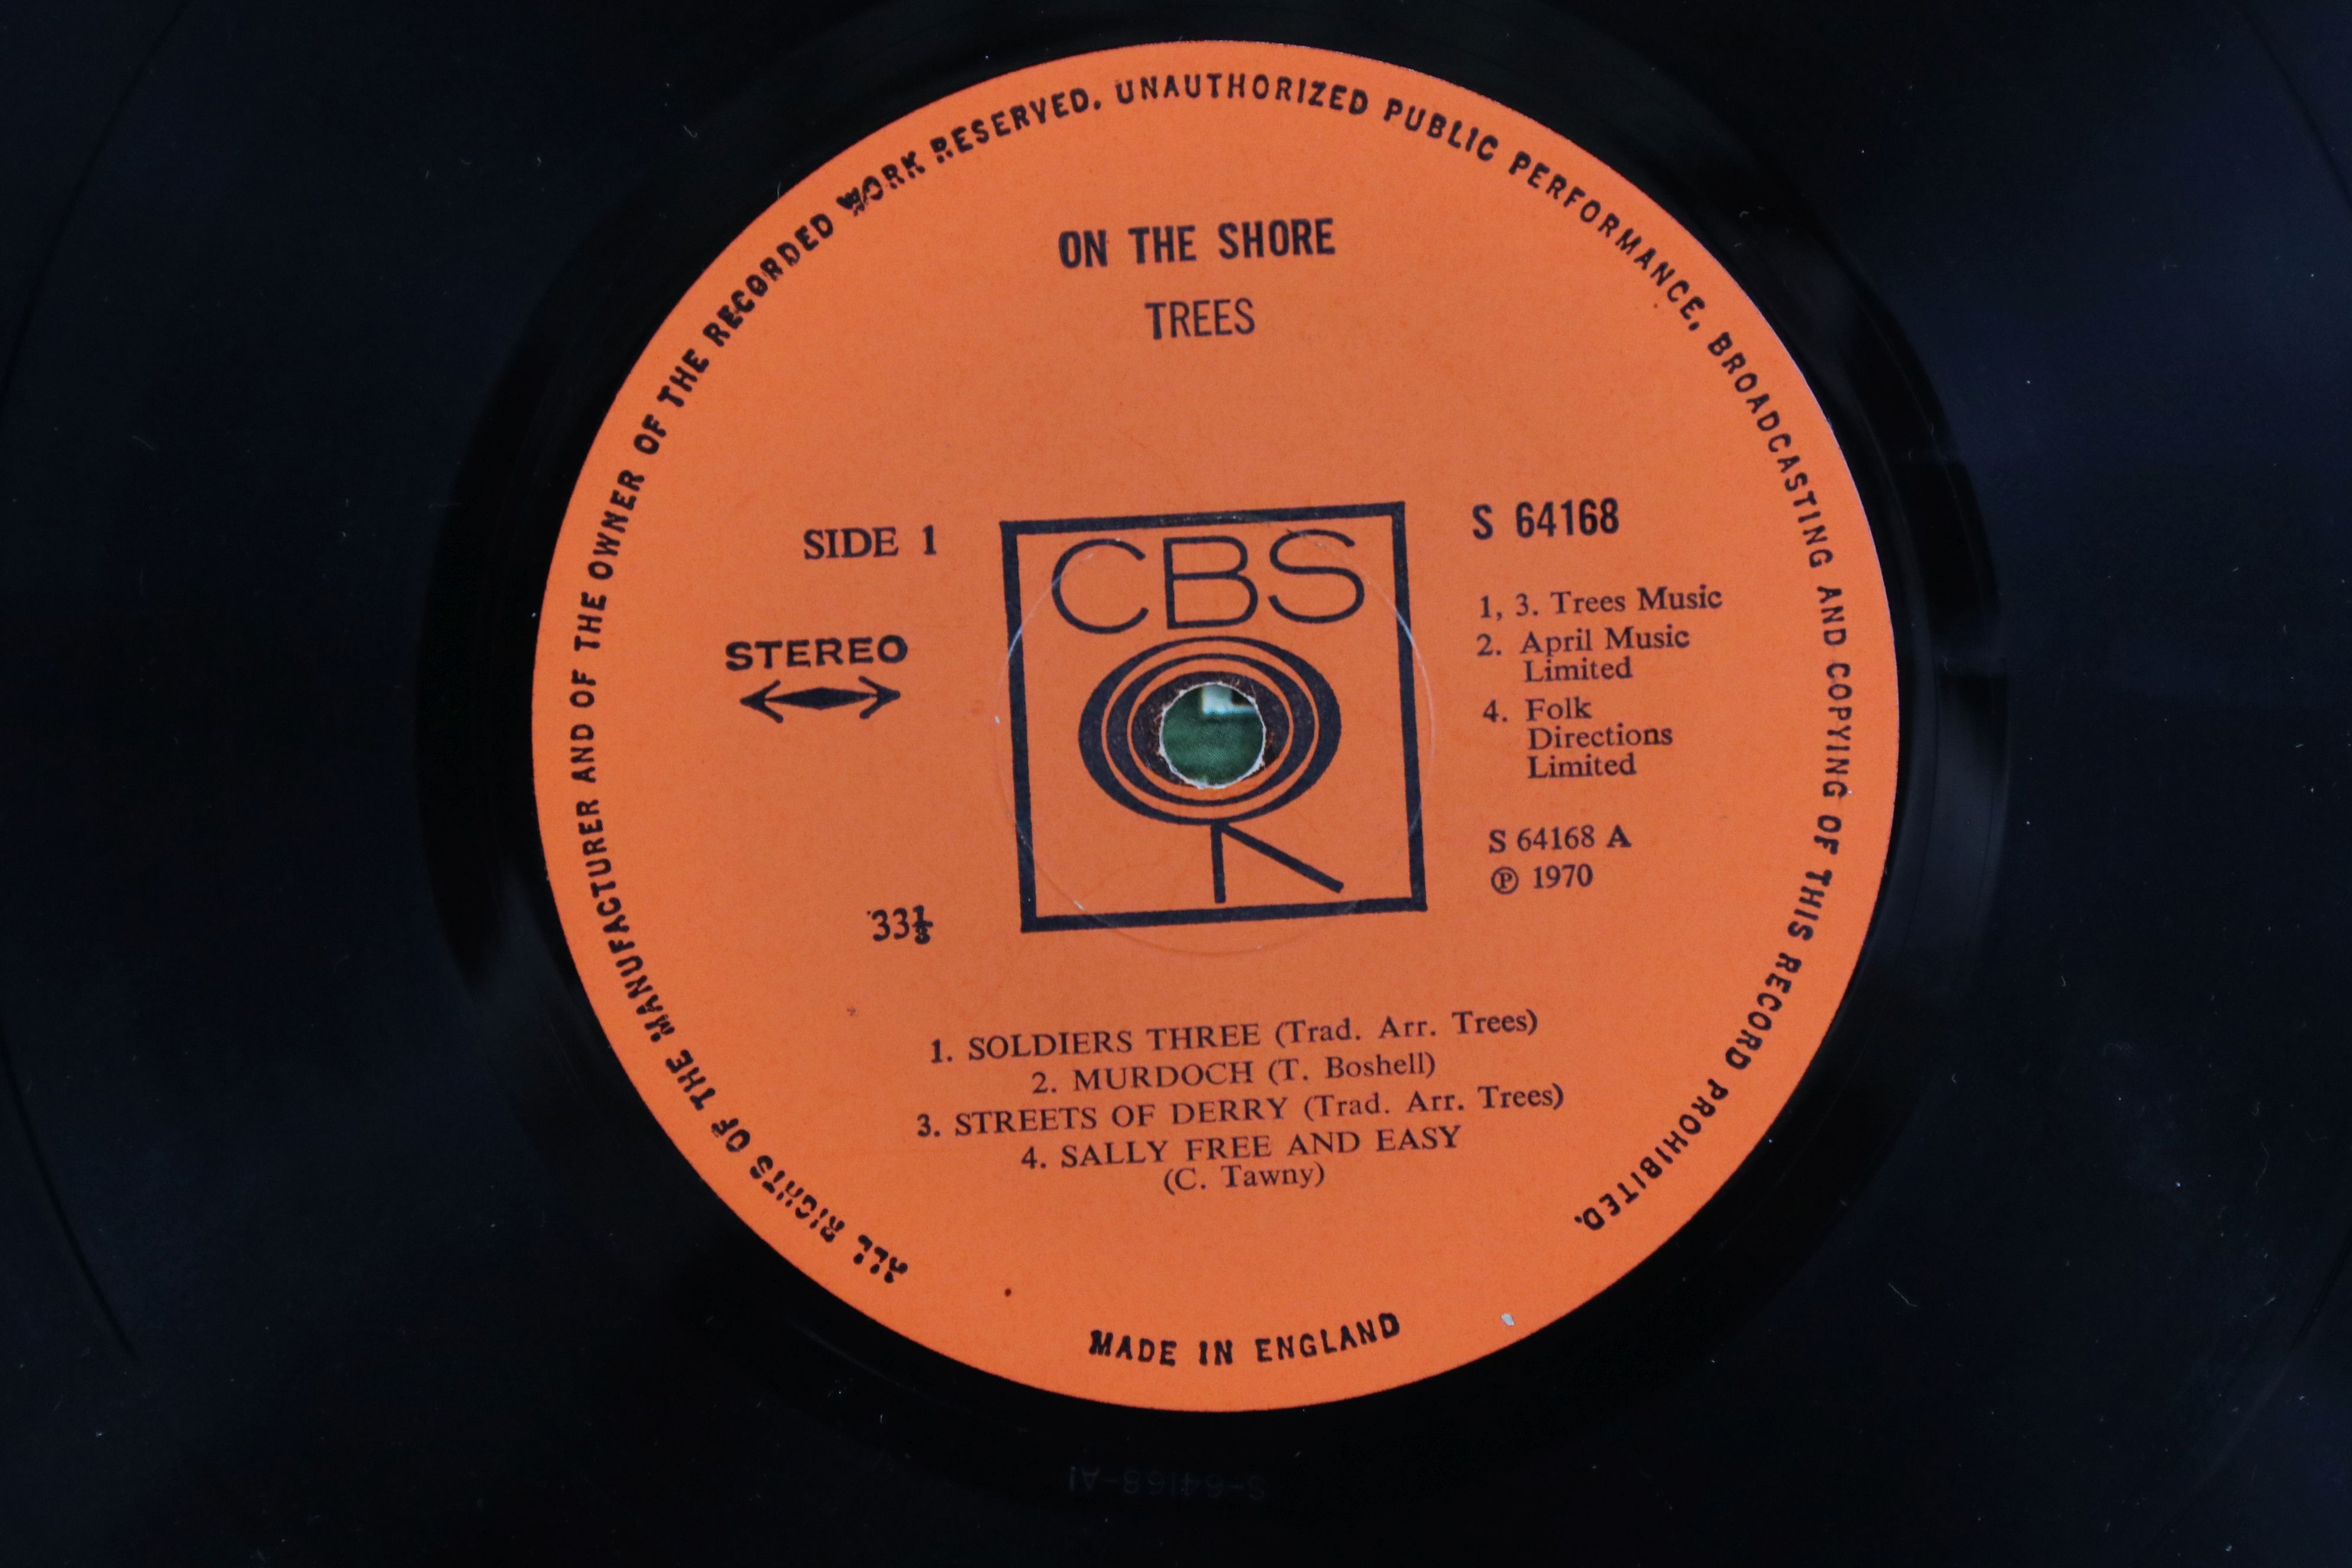 Vinyl - Trees On The Shore LP on CBS 64168 Stereo, vg+ - Image 3 of 4